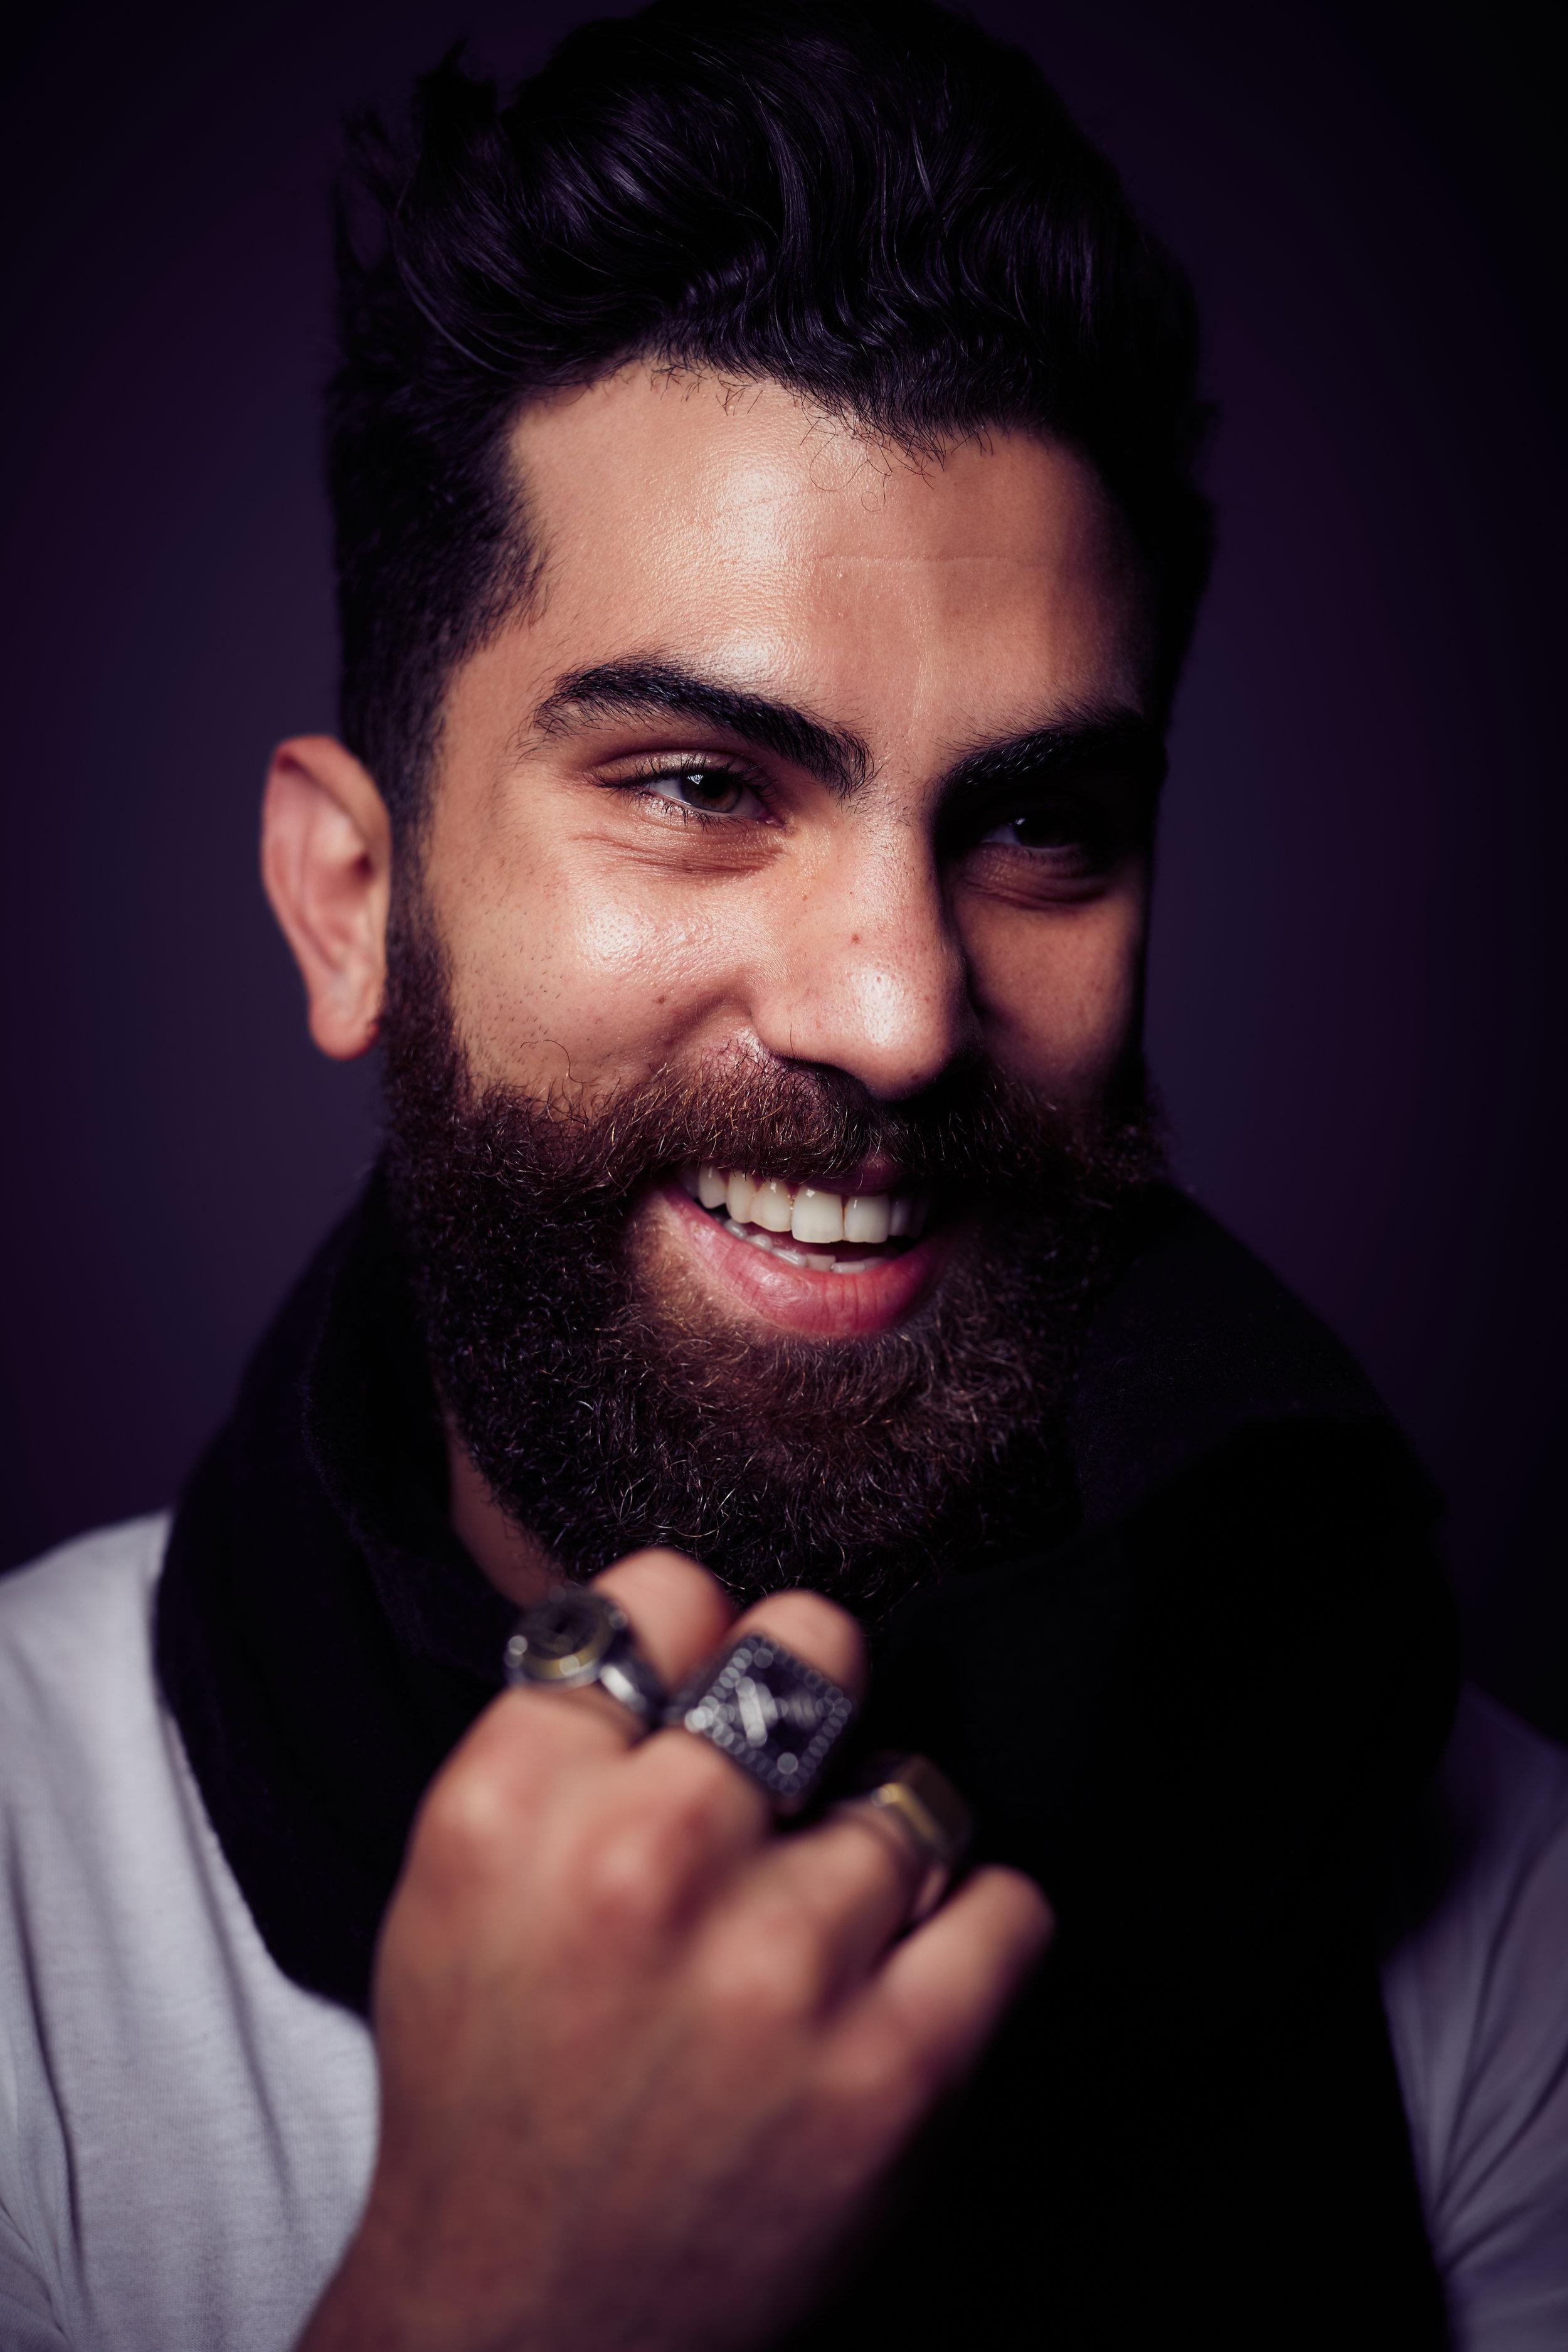 Portrait_063_Reza_Jackson_10212.jpg